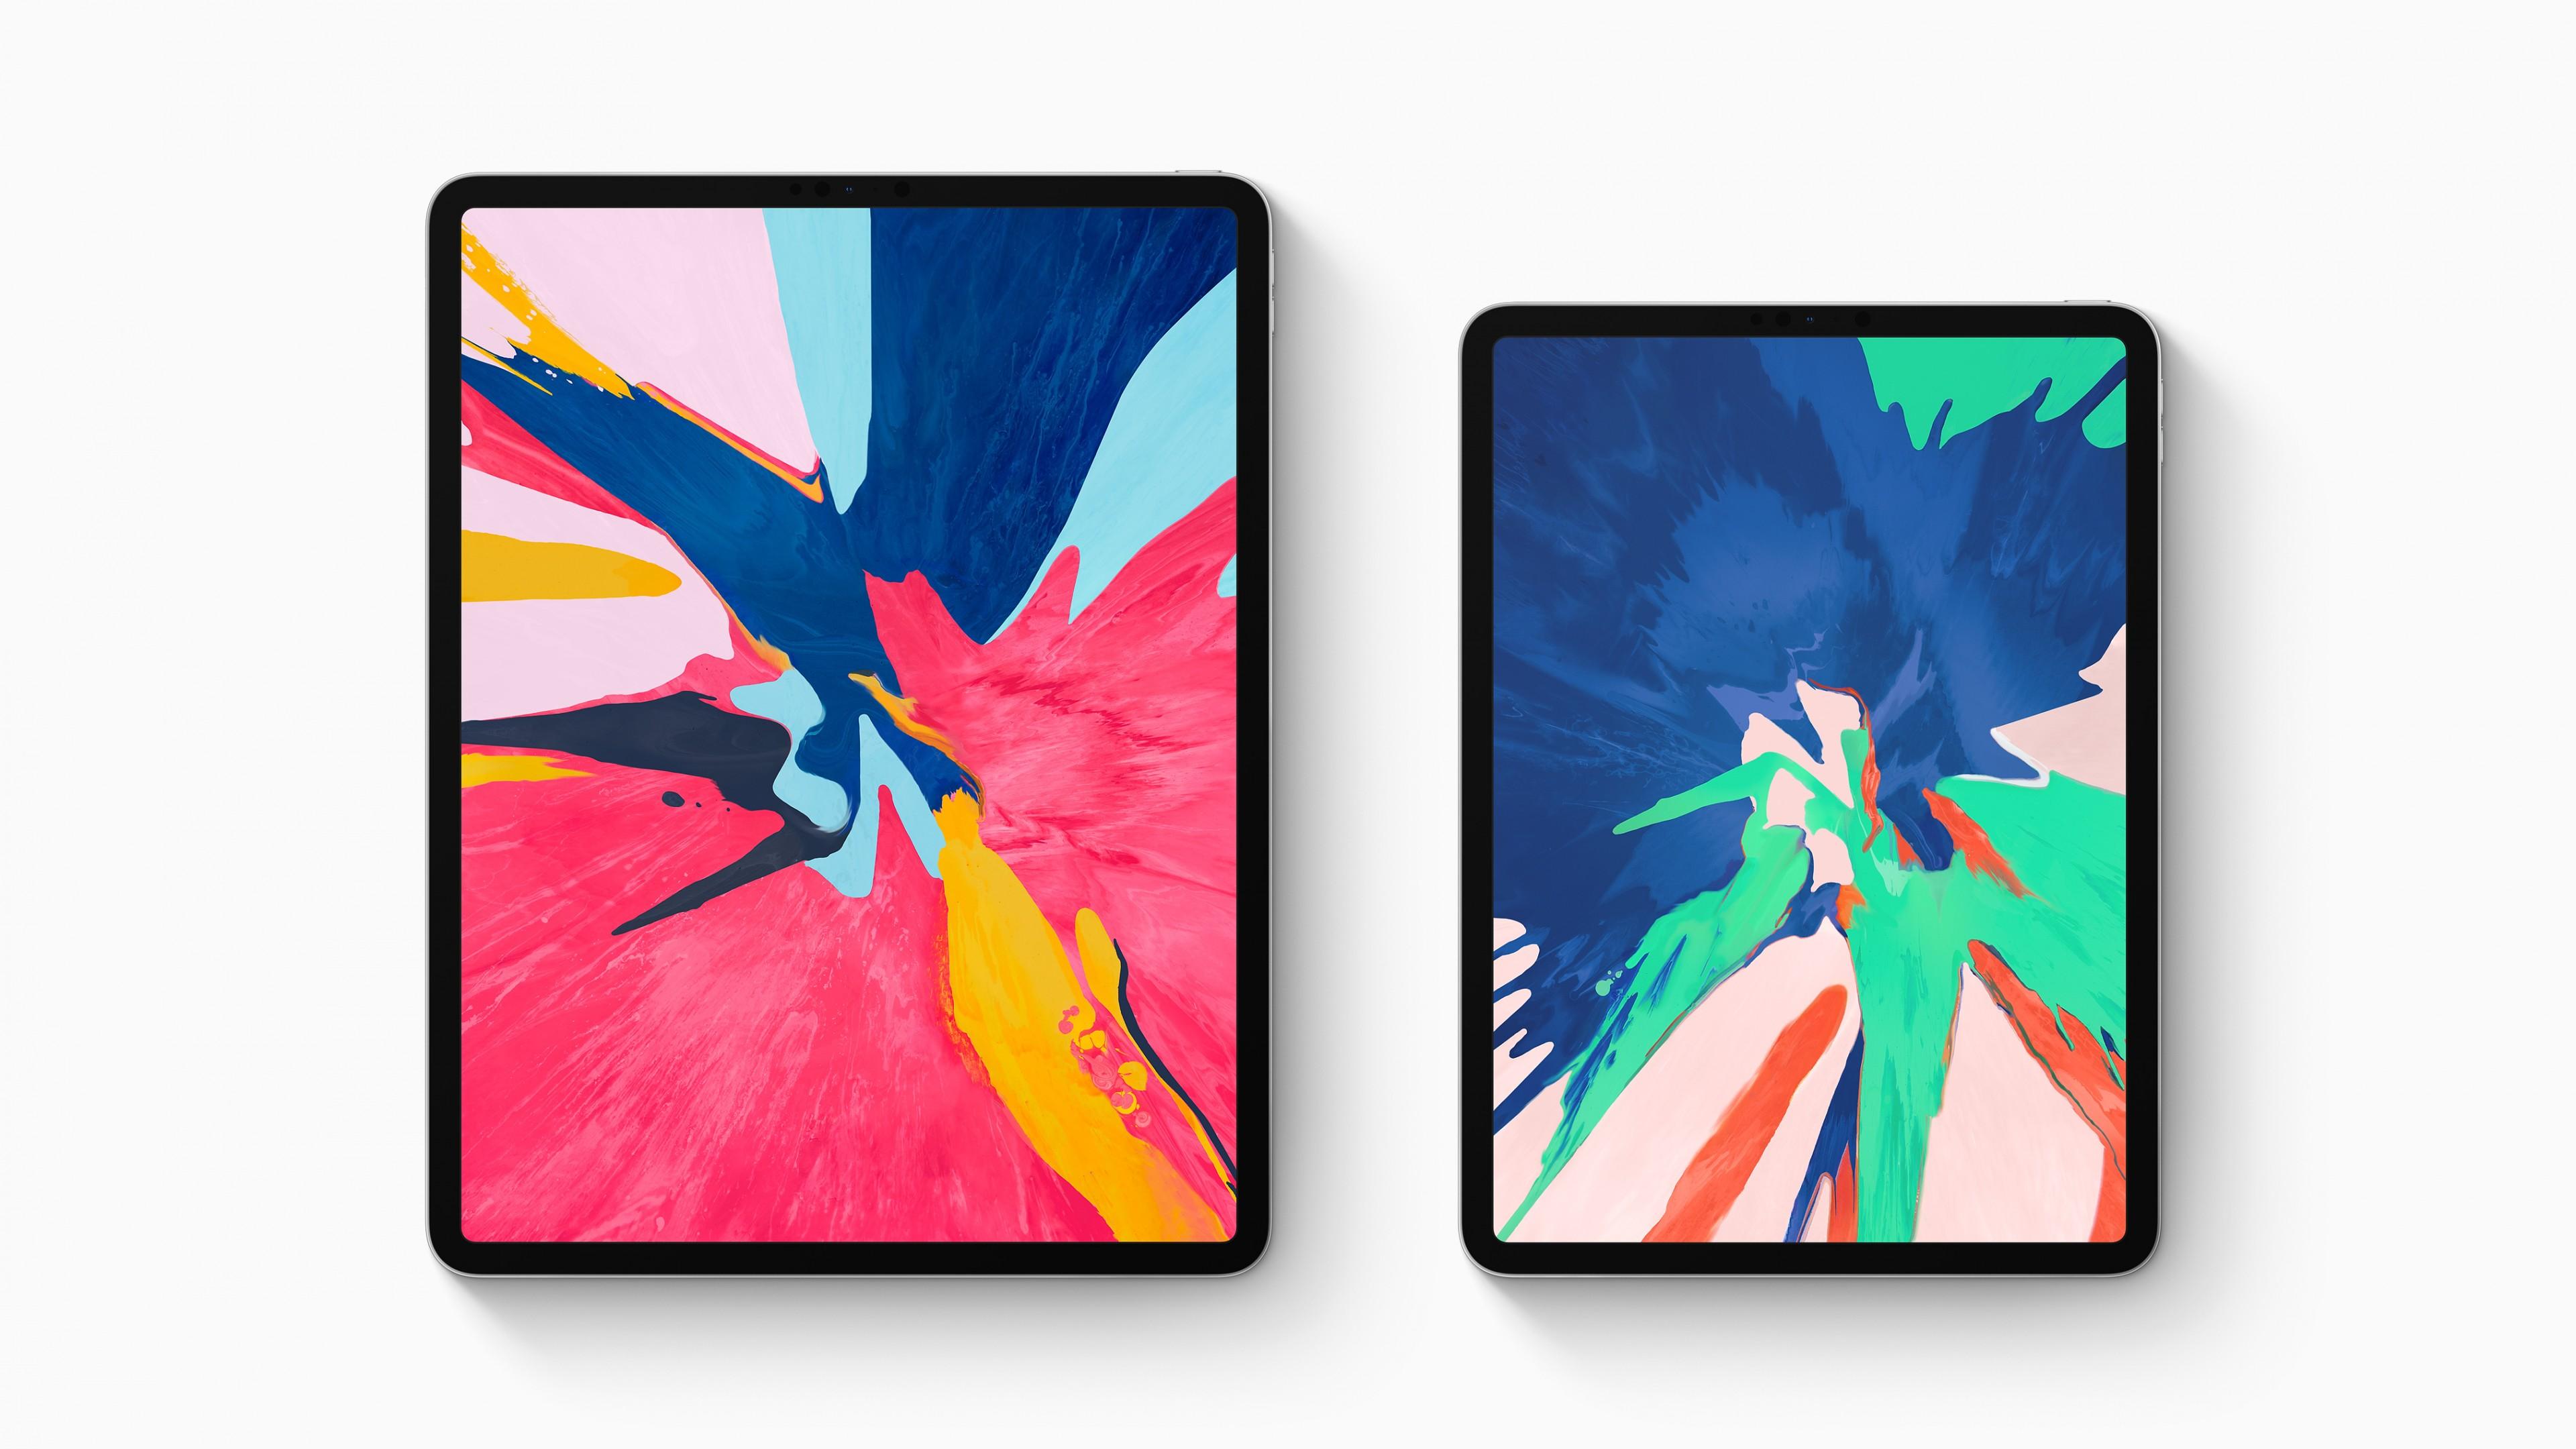 Unduh 100+ Wallpaper Apple Ipad Pro 2018